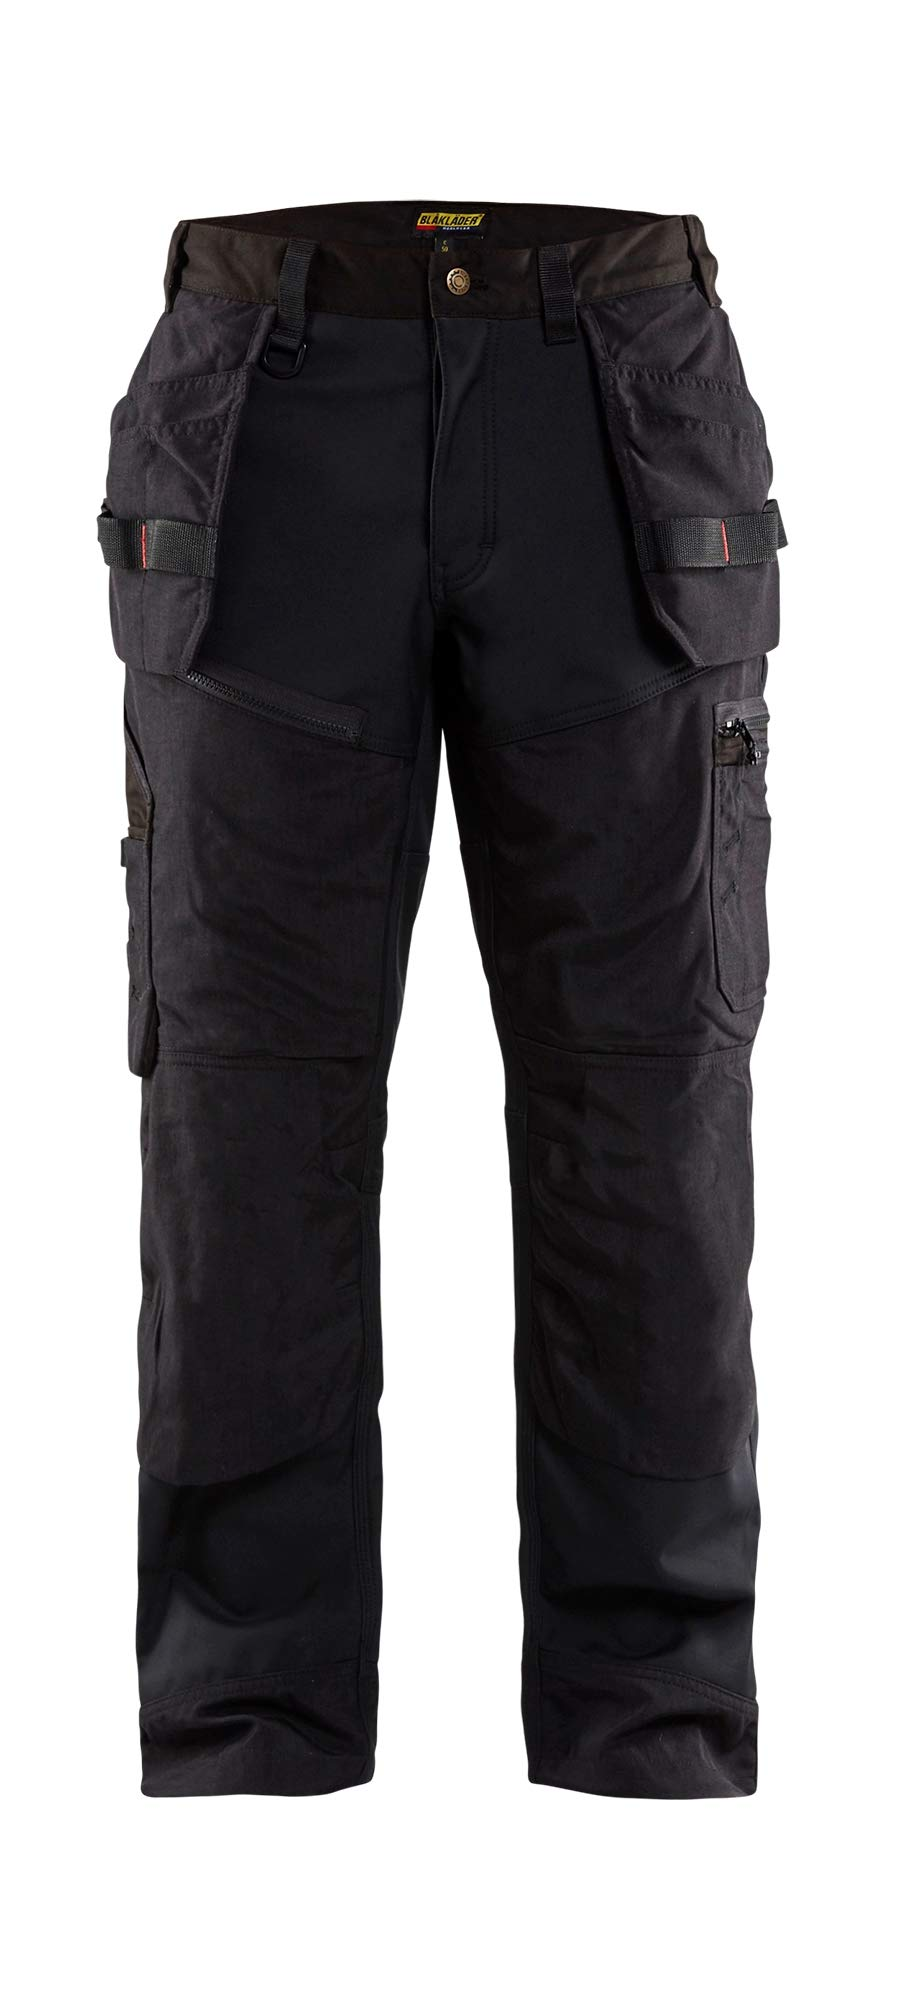 Blaklader 150025179900C60 X1500 Trousers Craftman, Size 44/34, Black